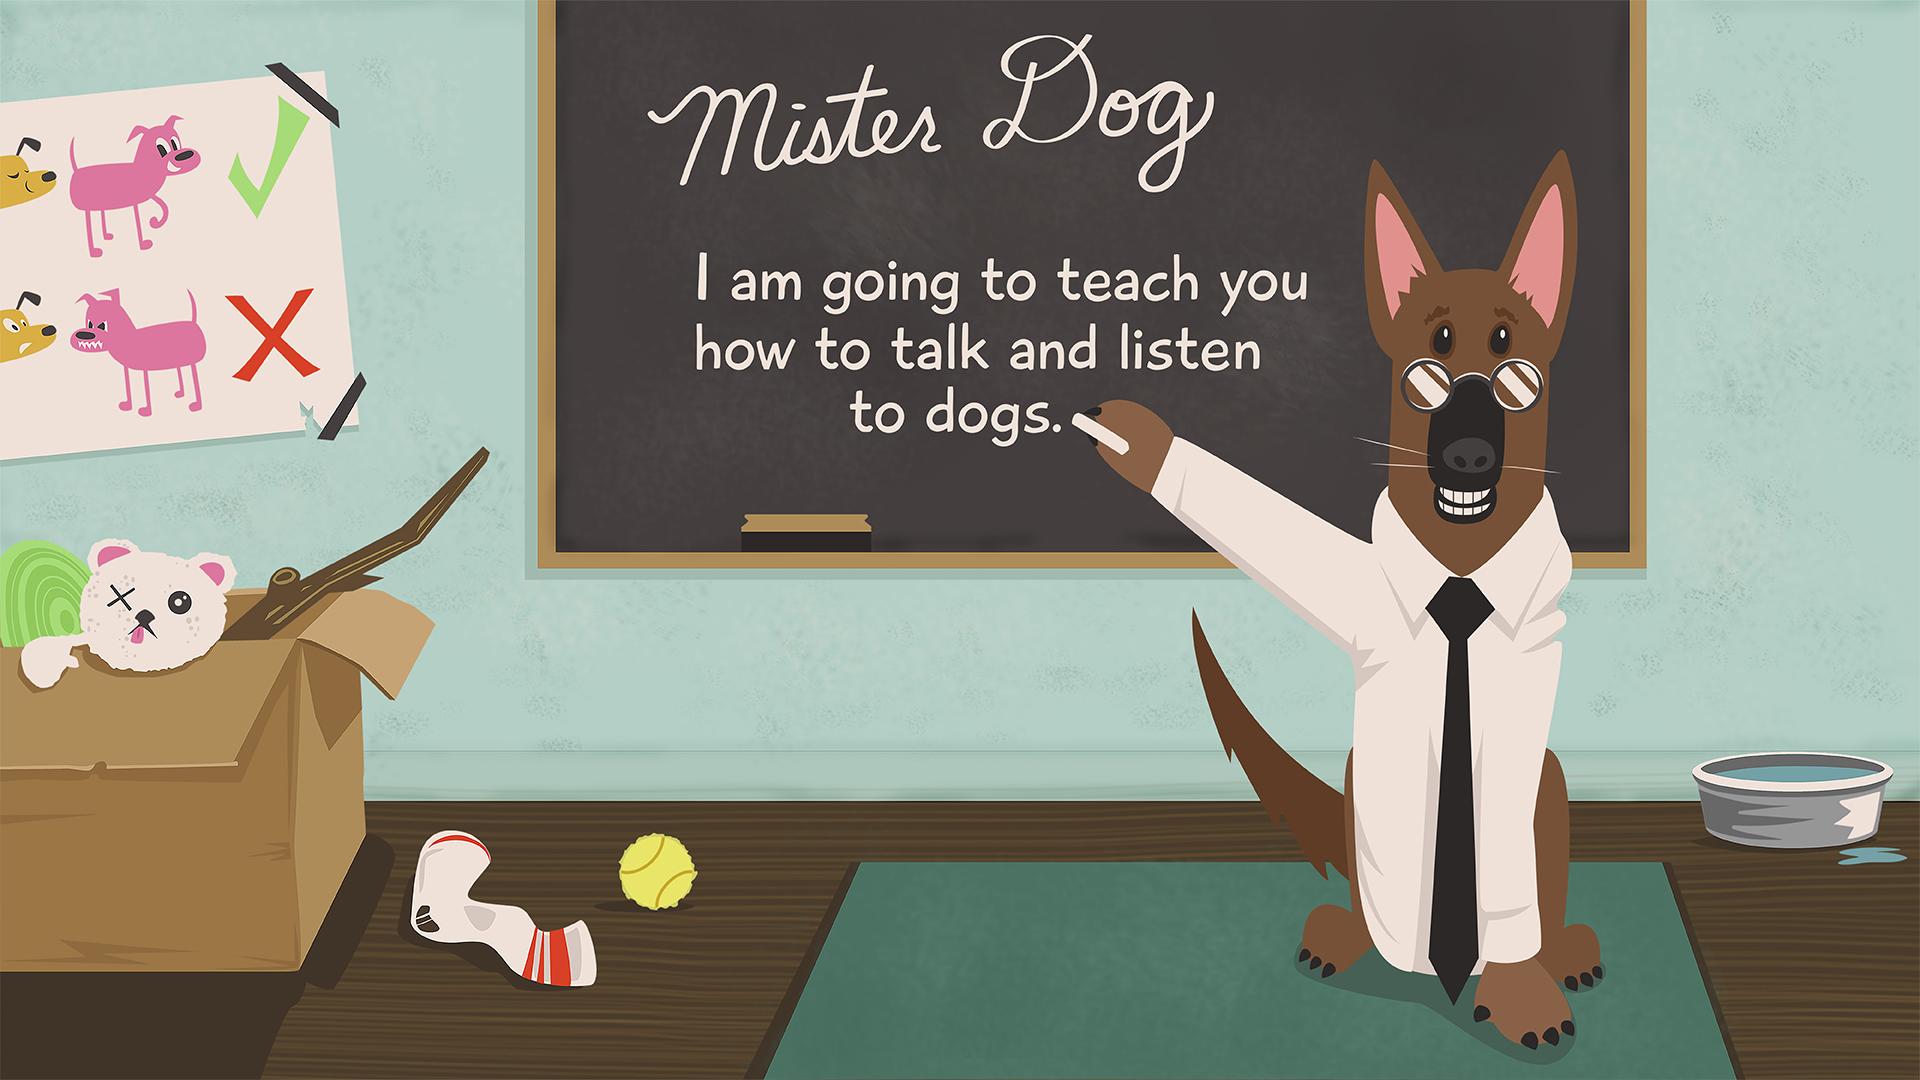 mister_dog_2_72DPI.jpg